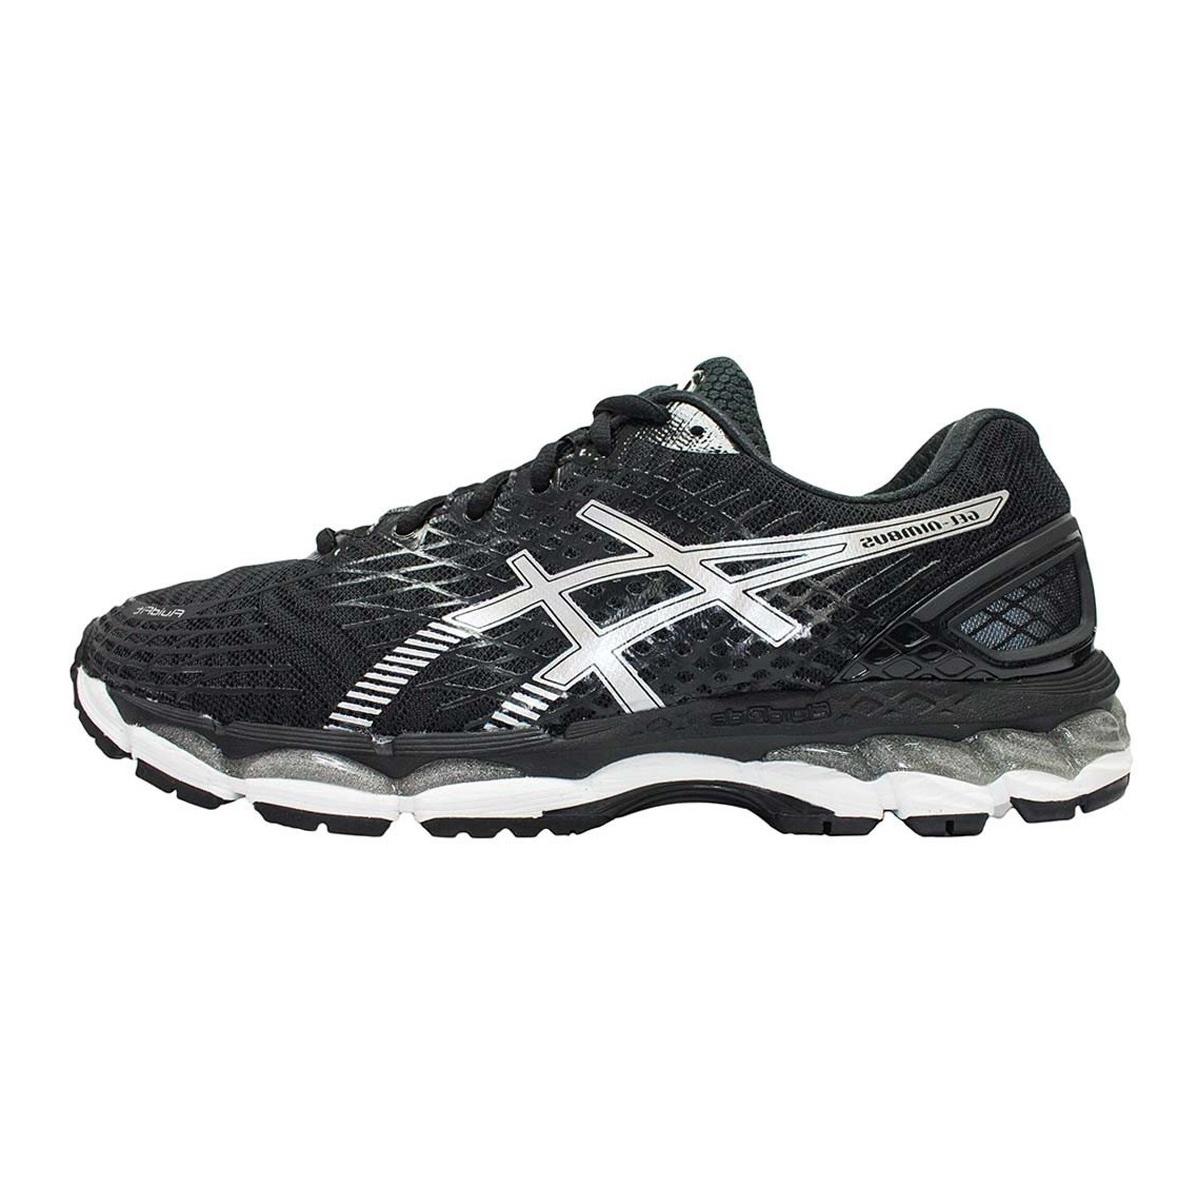 کفش مخصوص دویدن زنانه اسیکس مدل GEL- Nimbus 17 کد T557N-9093